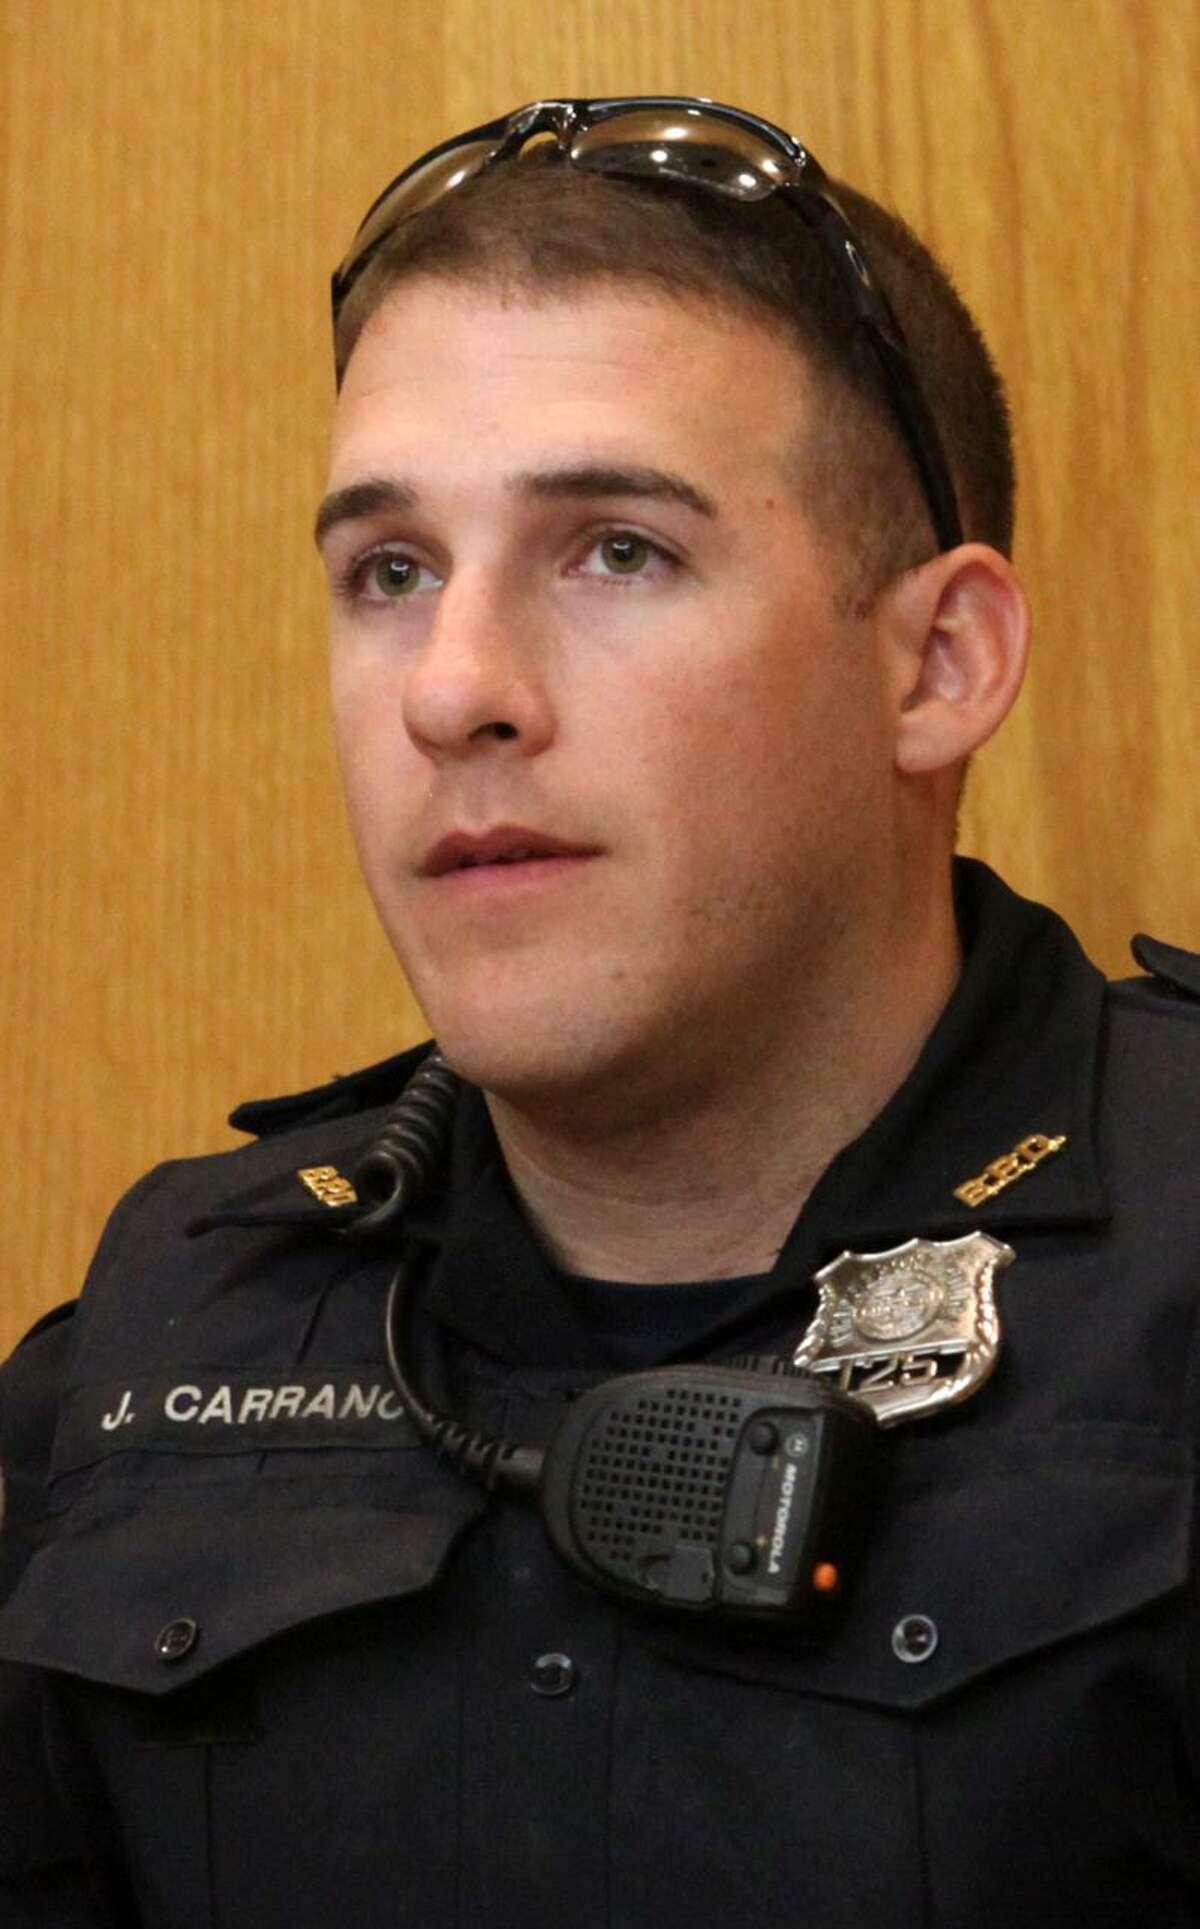 Bridgeport police officer John Carrano